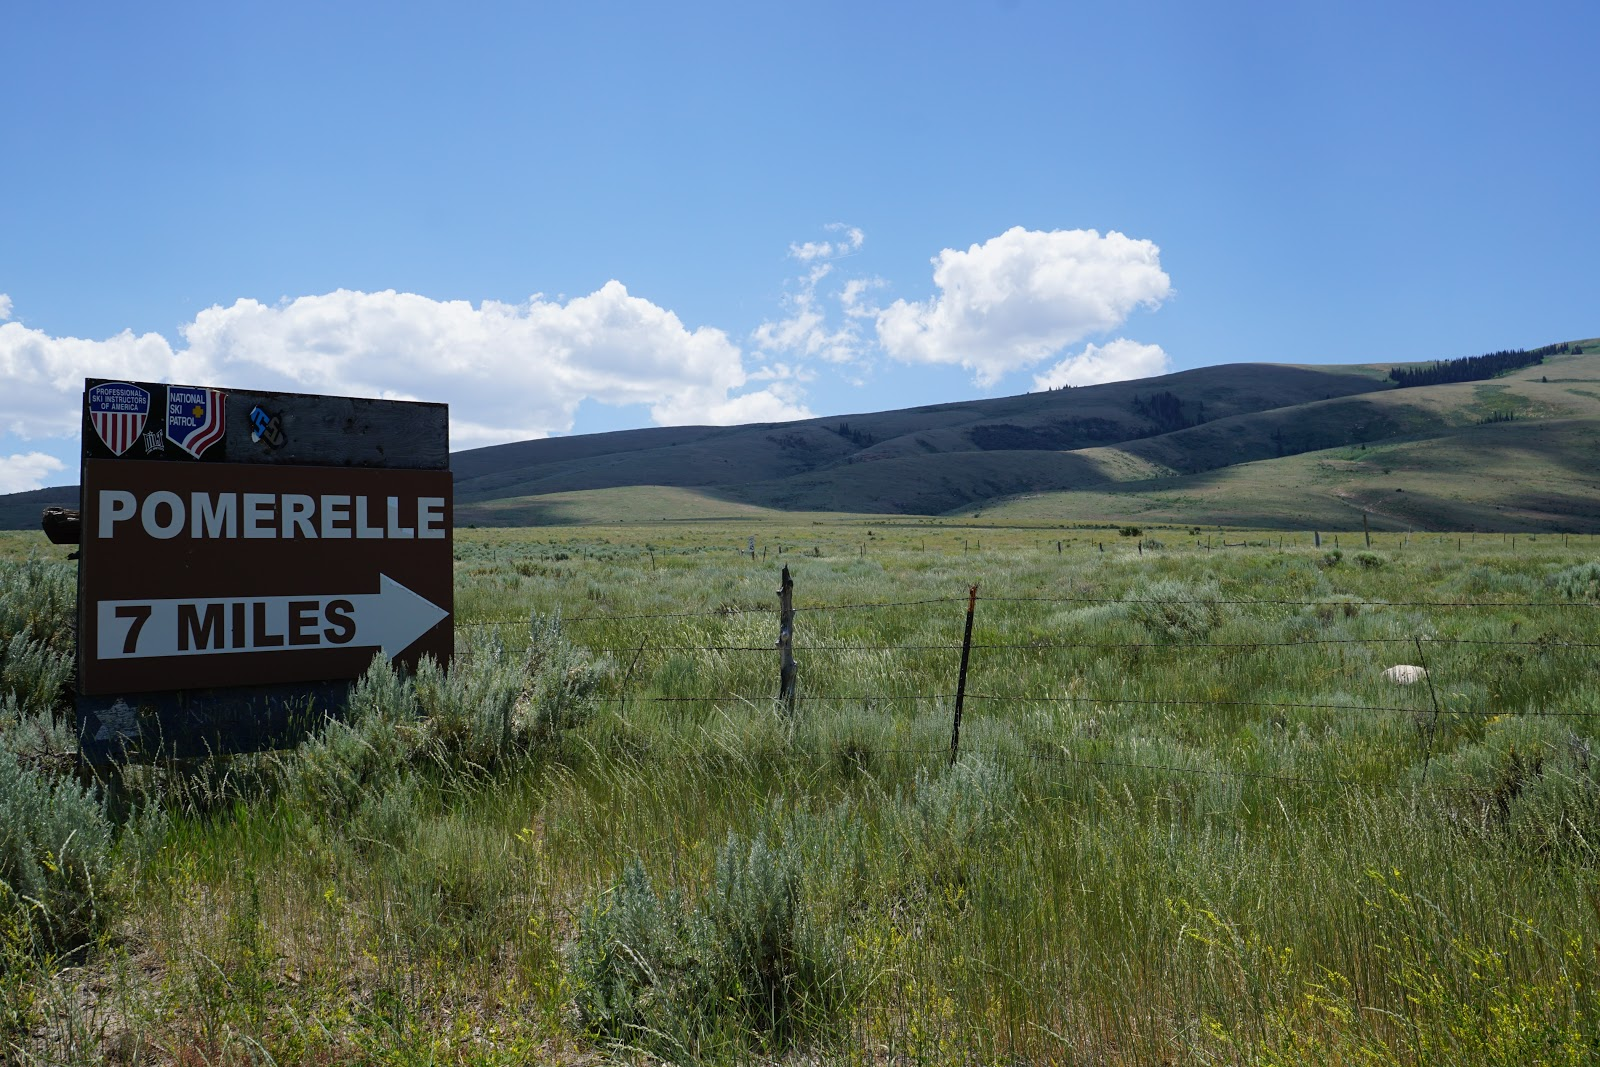 Bike climb Mt. Harrison - Pomerelle turn off sign